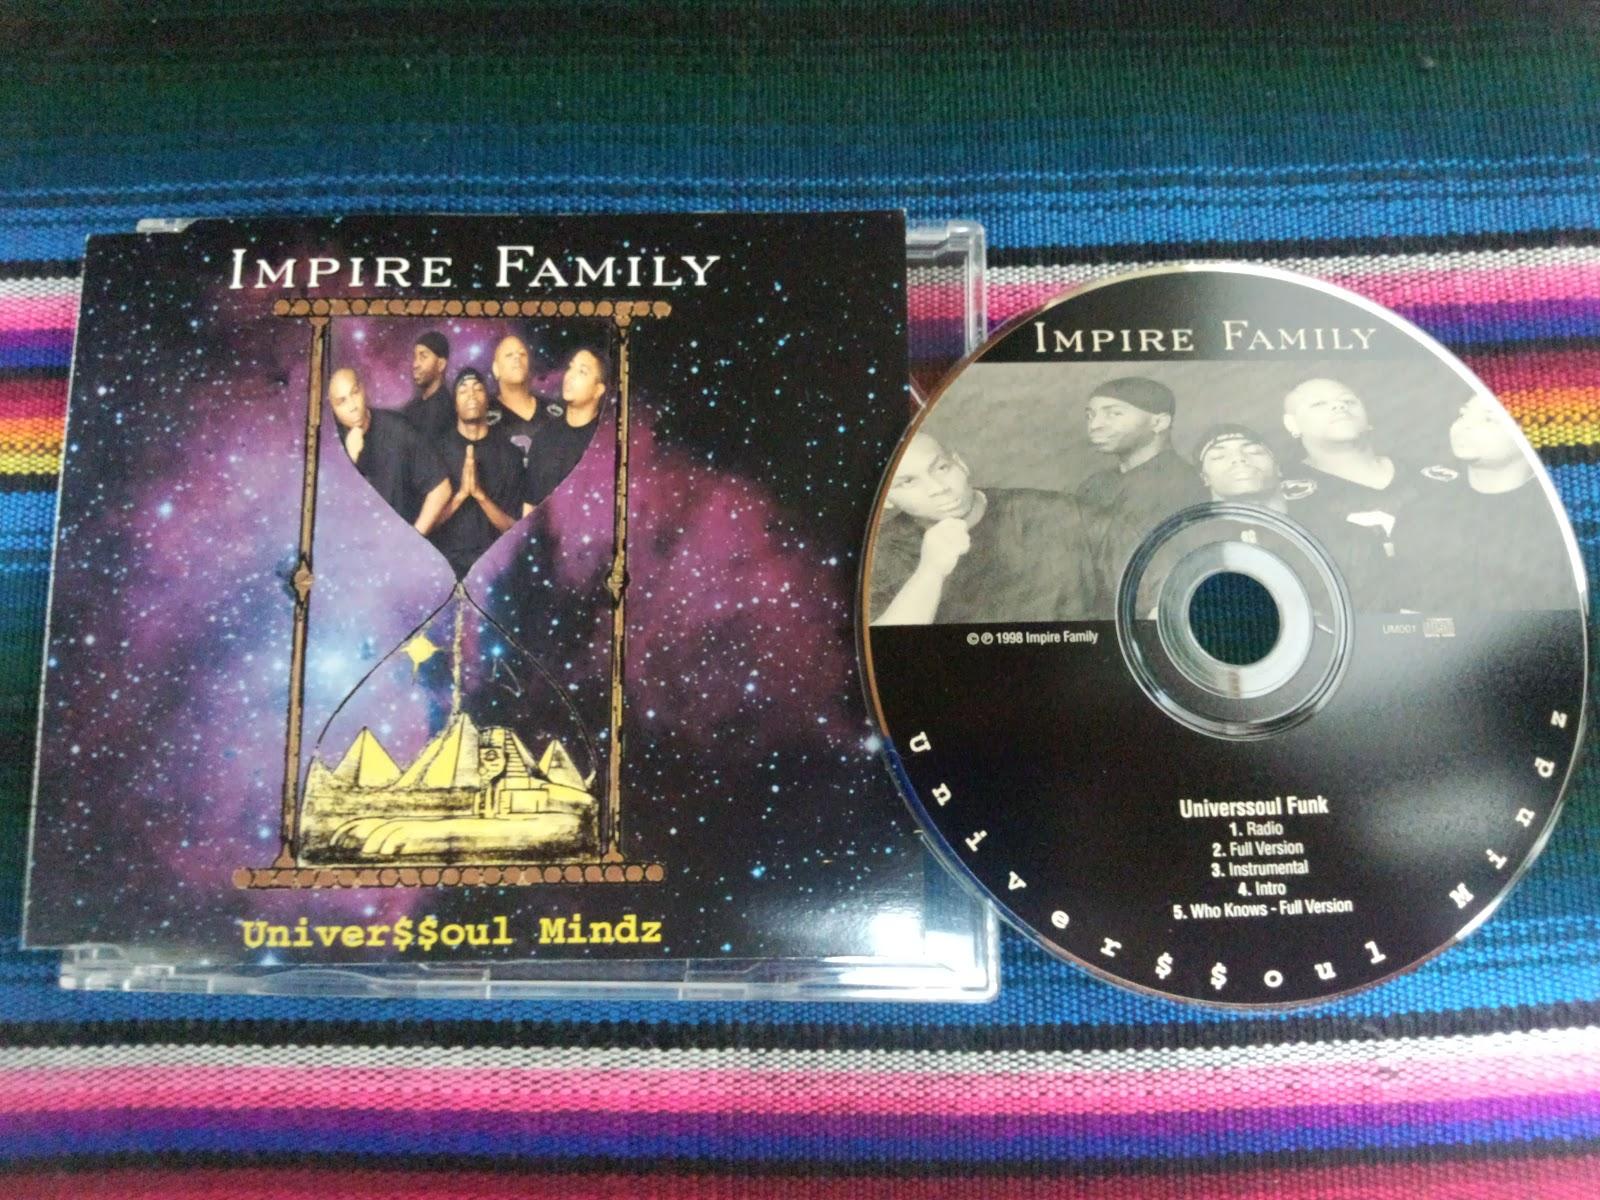 Impire Family Universsoul Mindz Rose Boyz